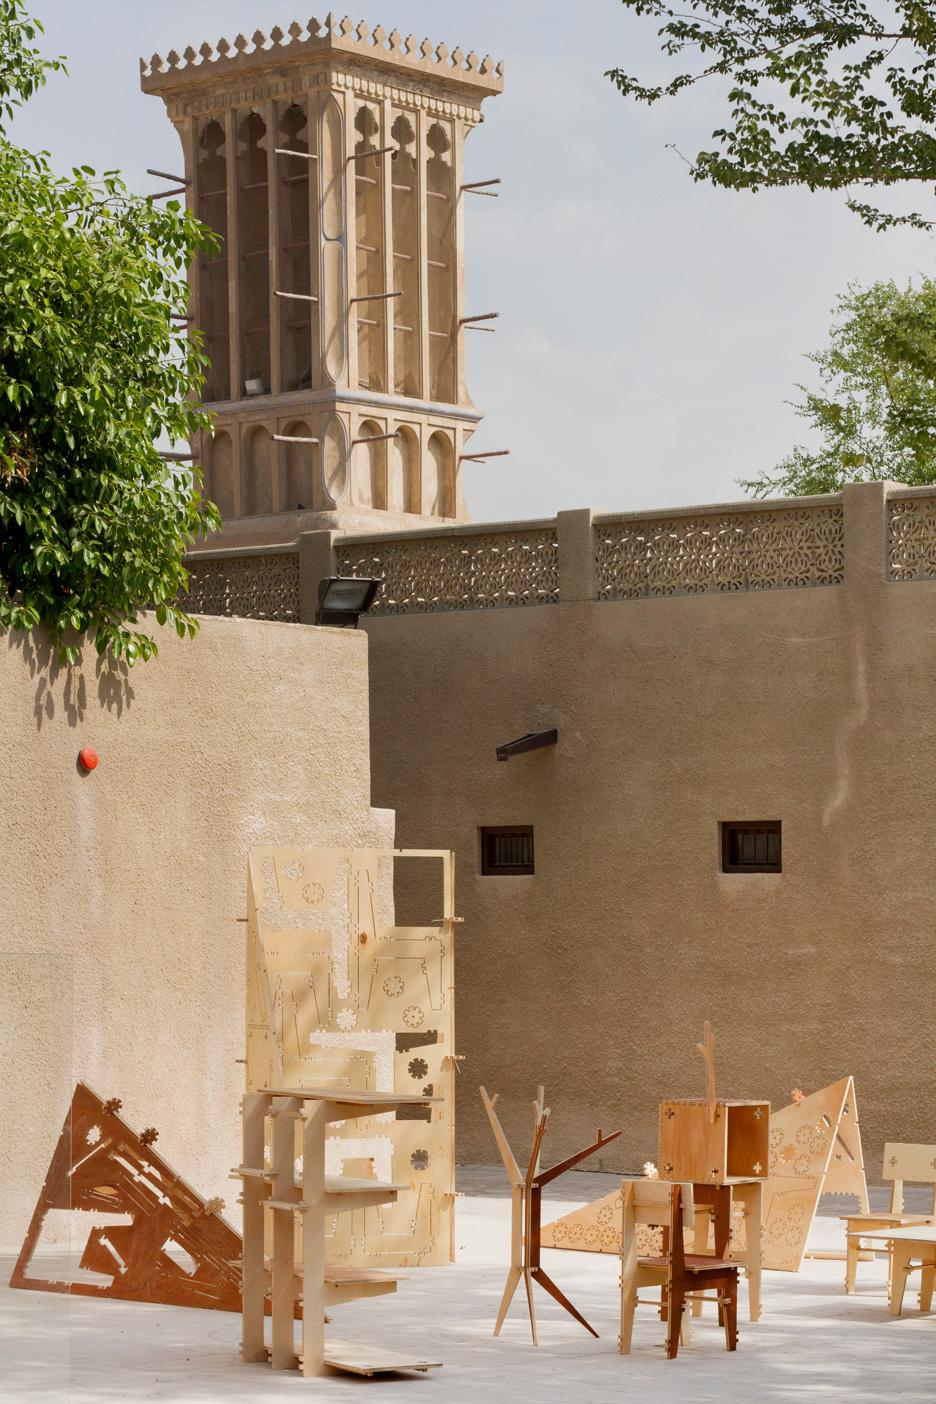 Deconstruction Zone installation by Henrique Stabile at Dubai Design Week 2015